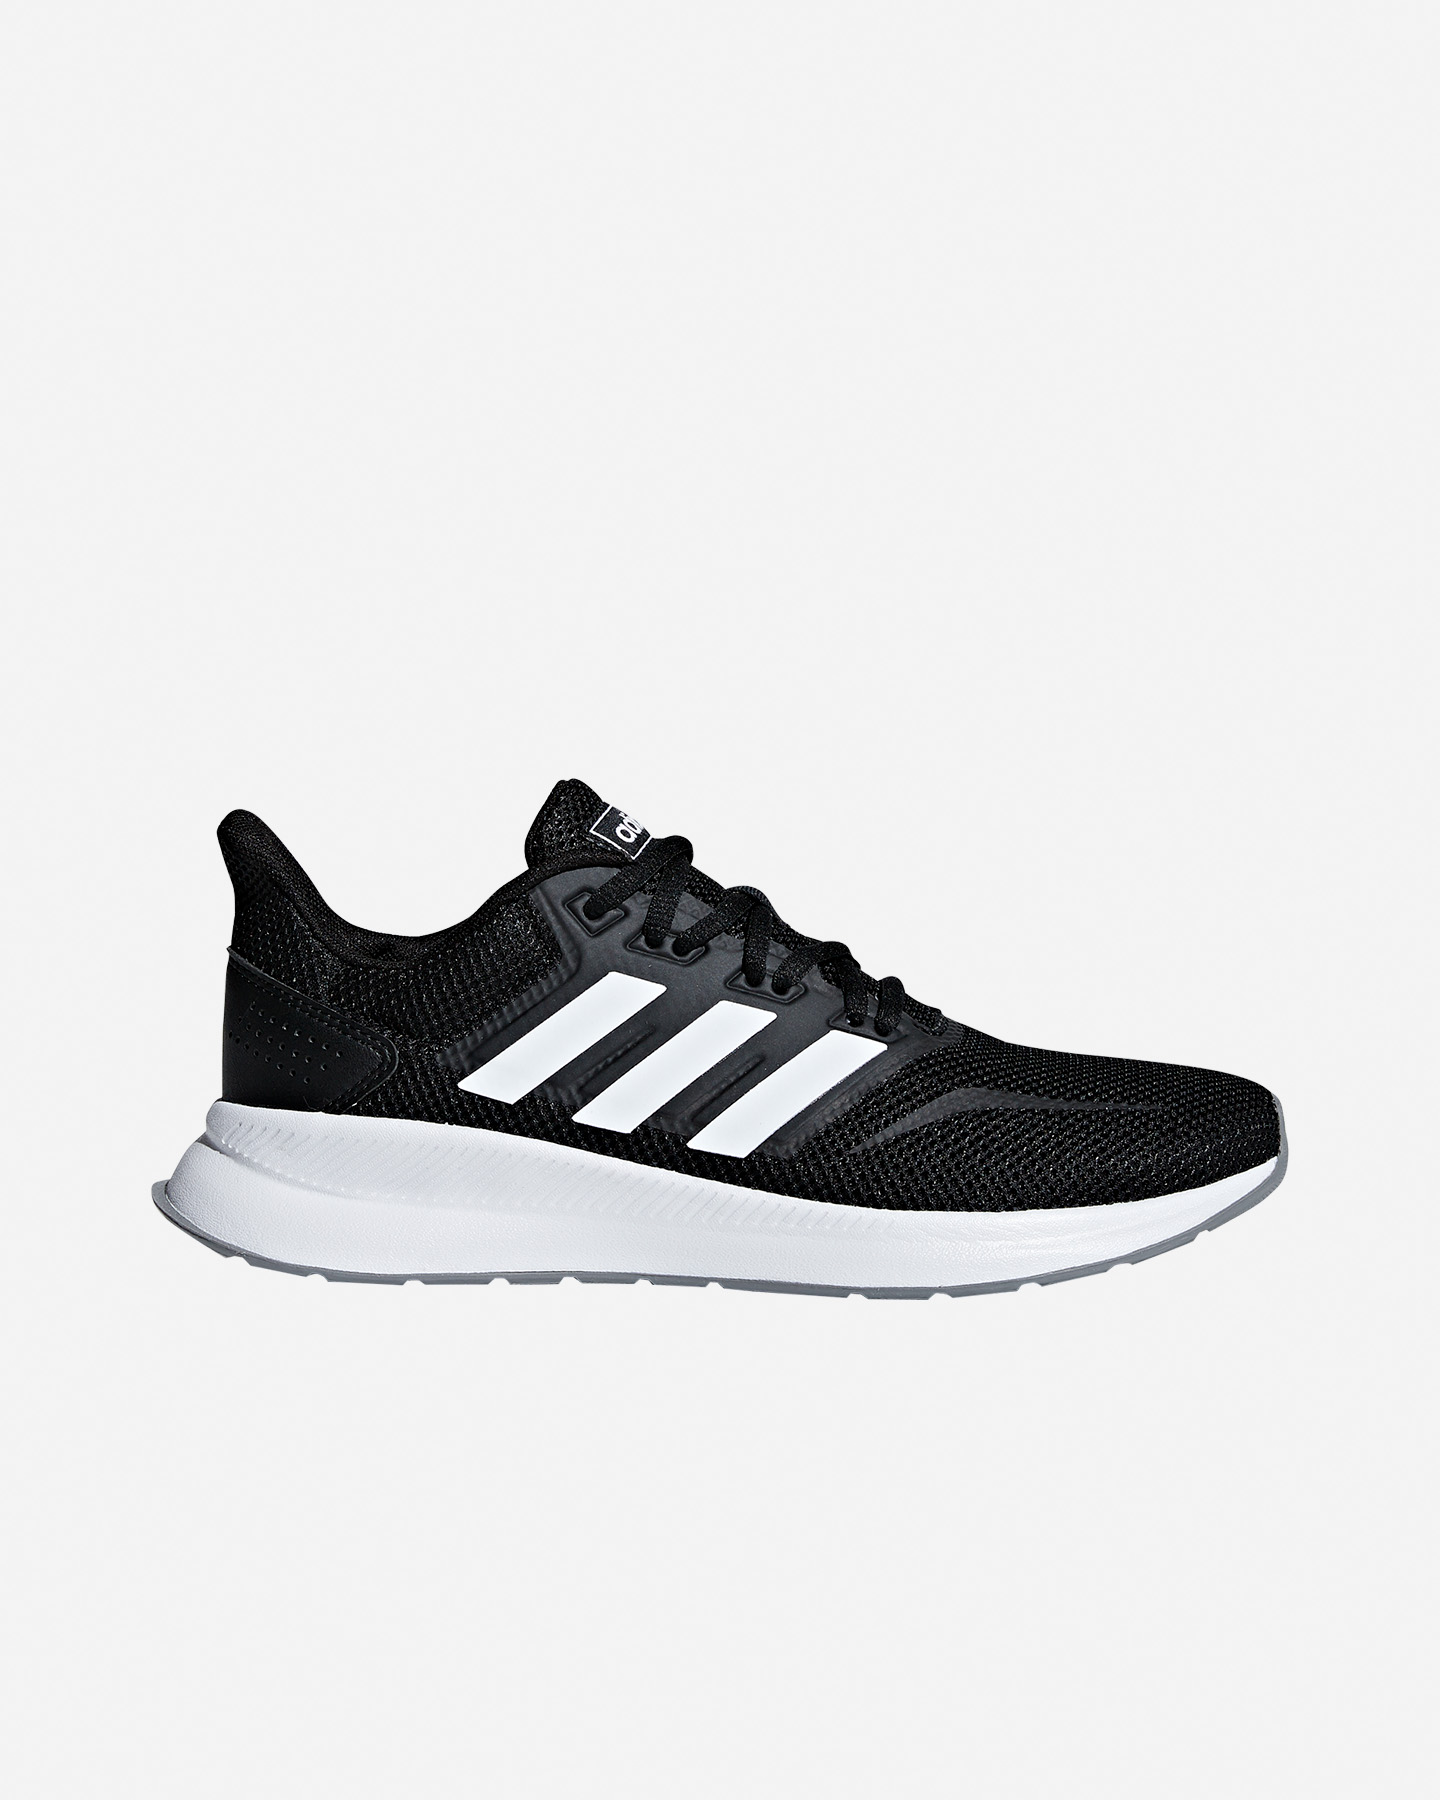 Adidas - Runfalcon W - Scarpe Running - Donna